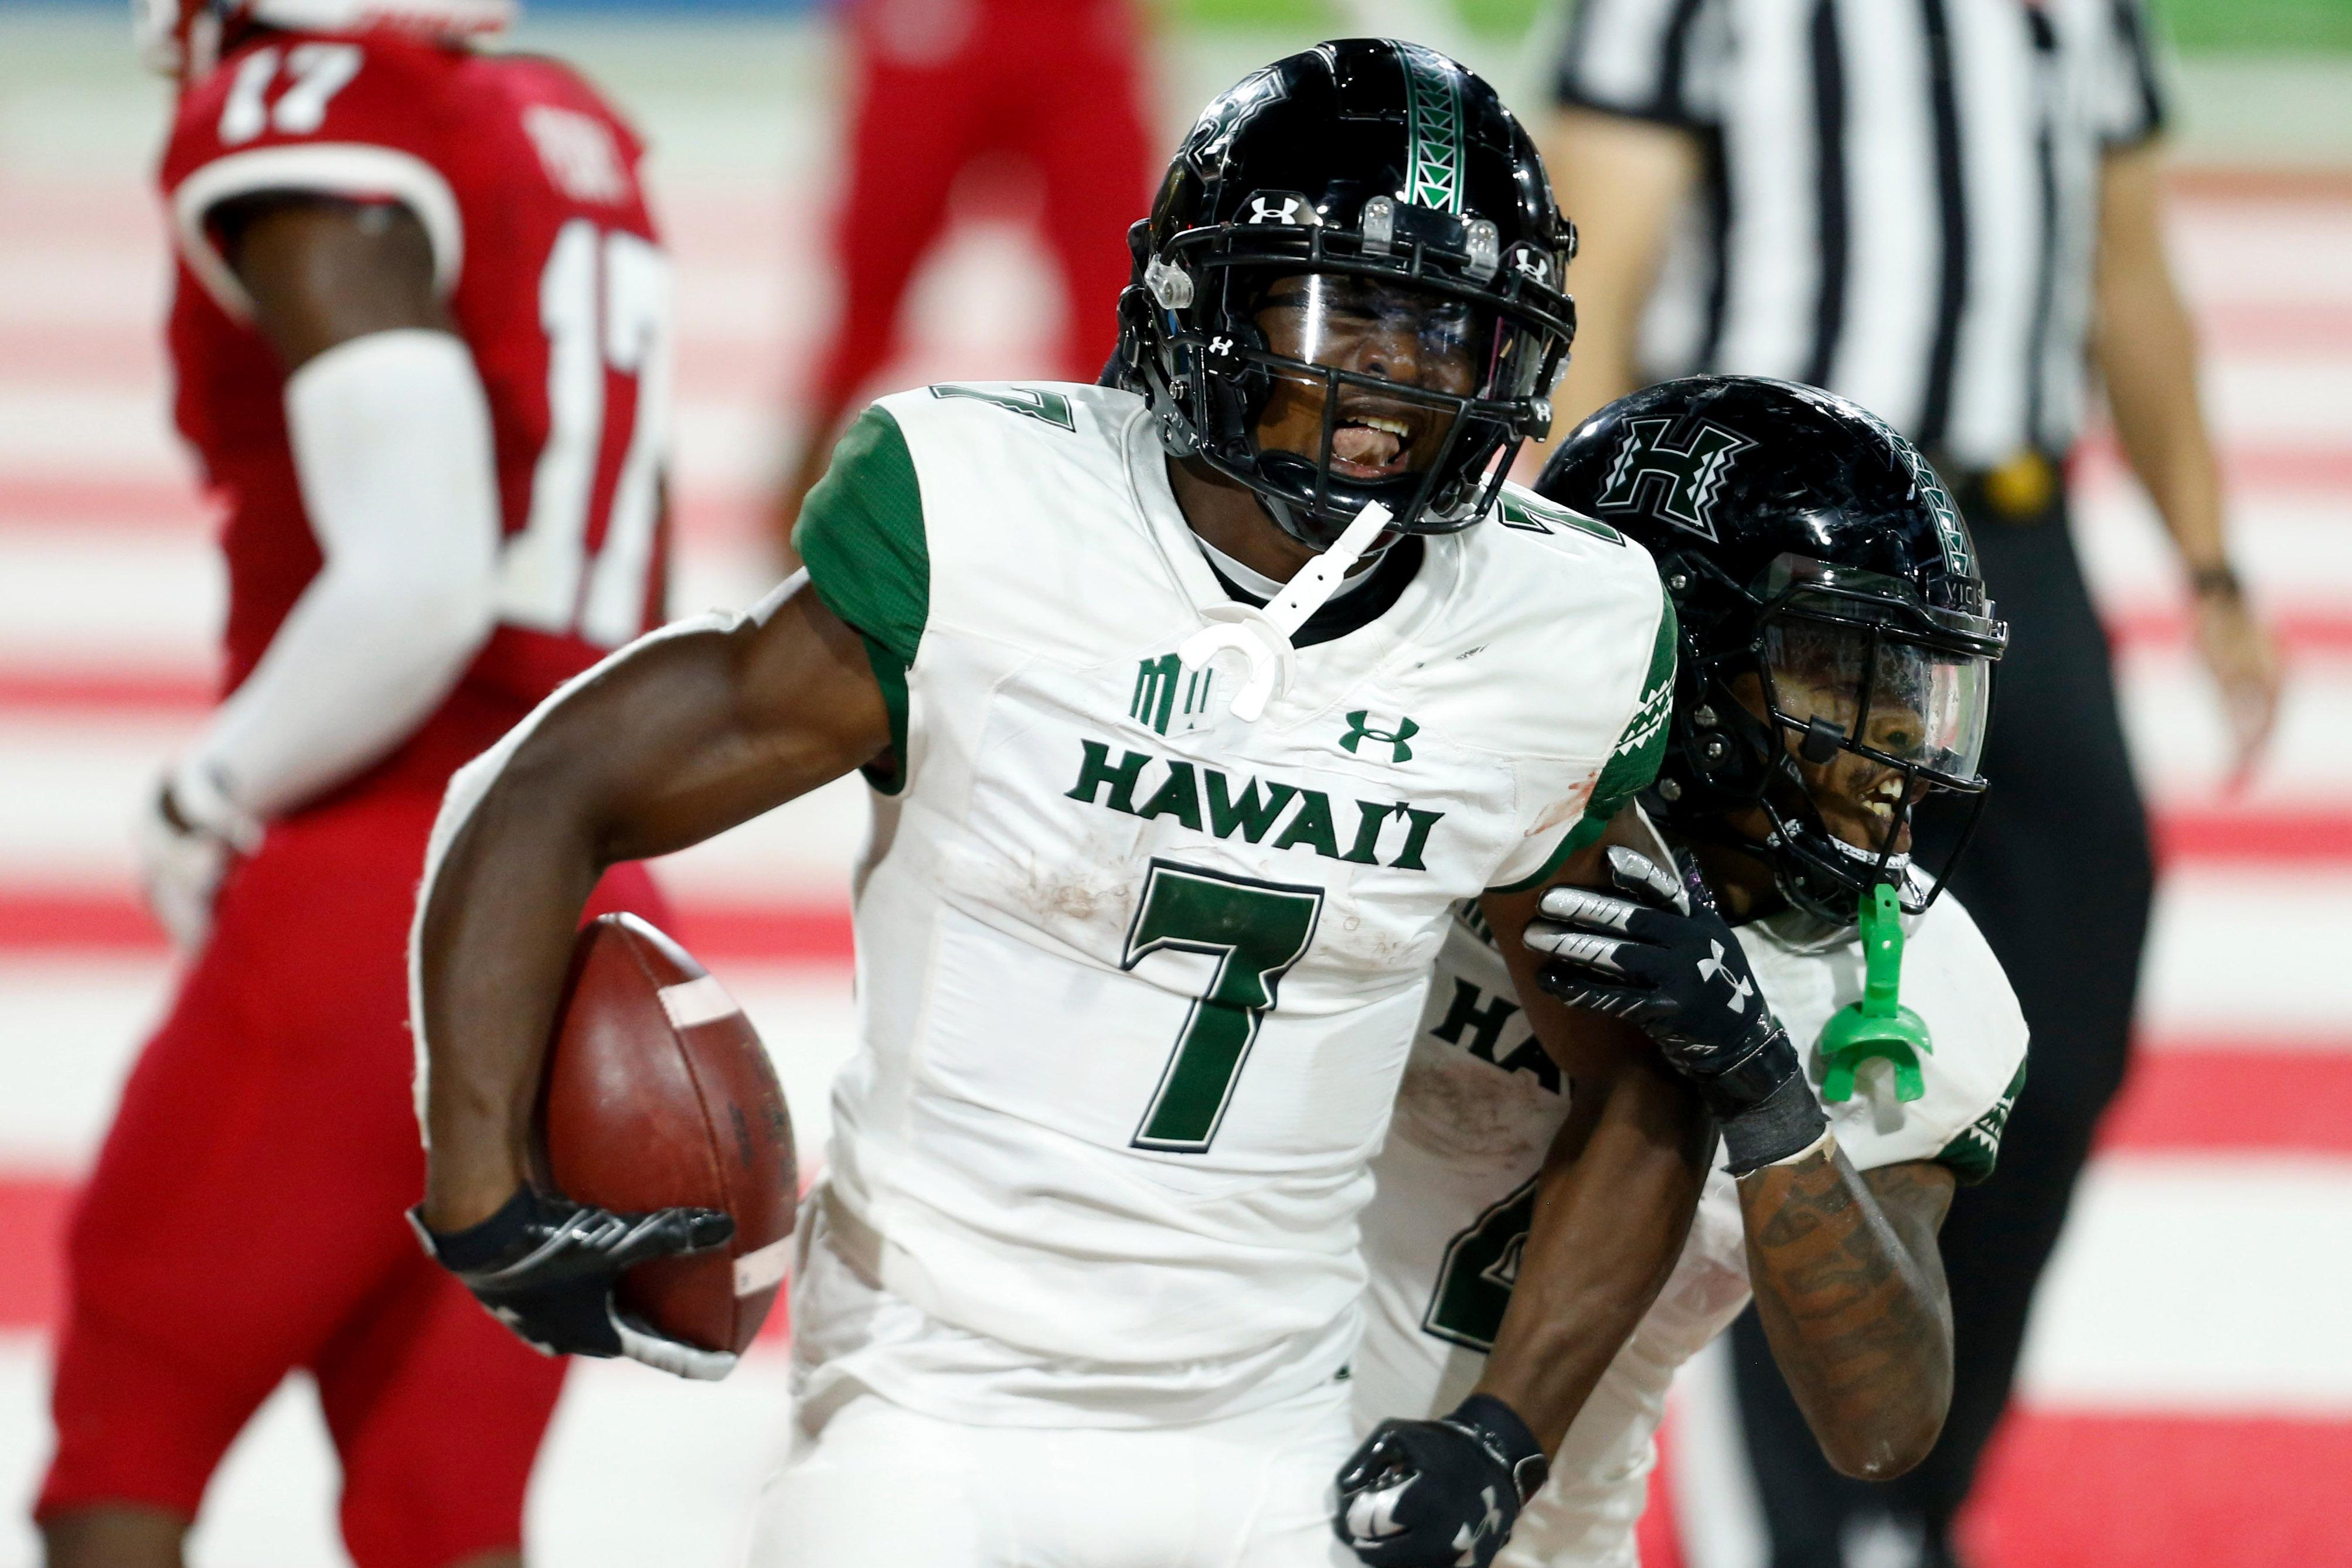 NCAA Football: Hawaii at Fresno State